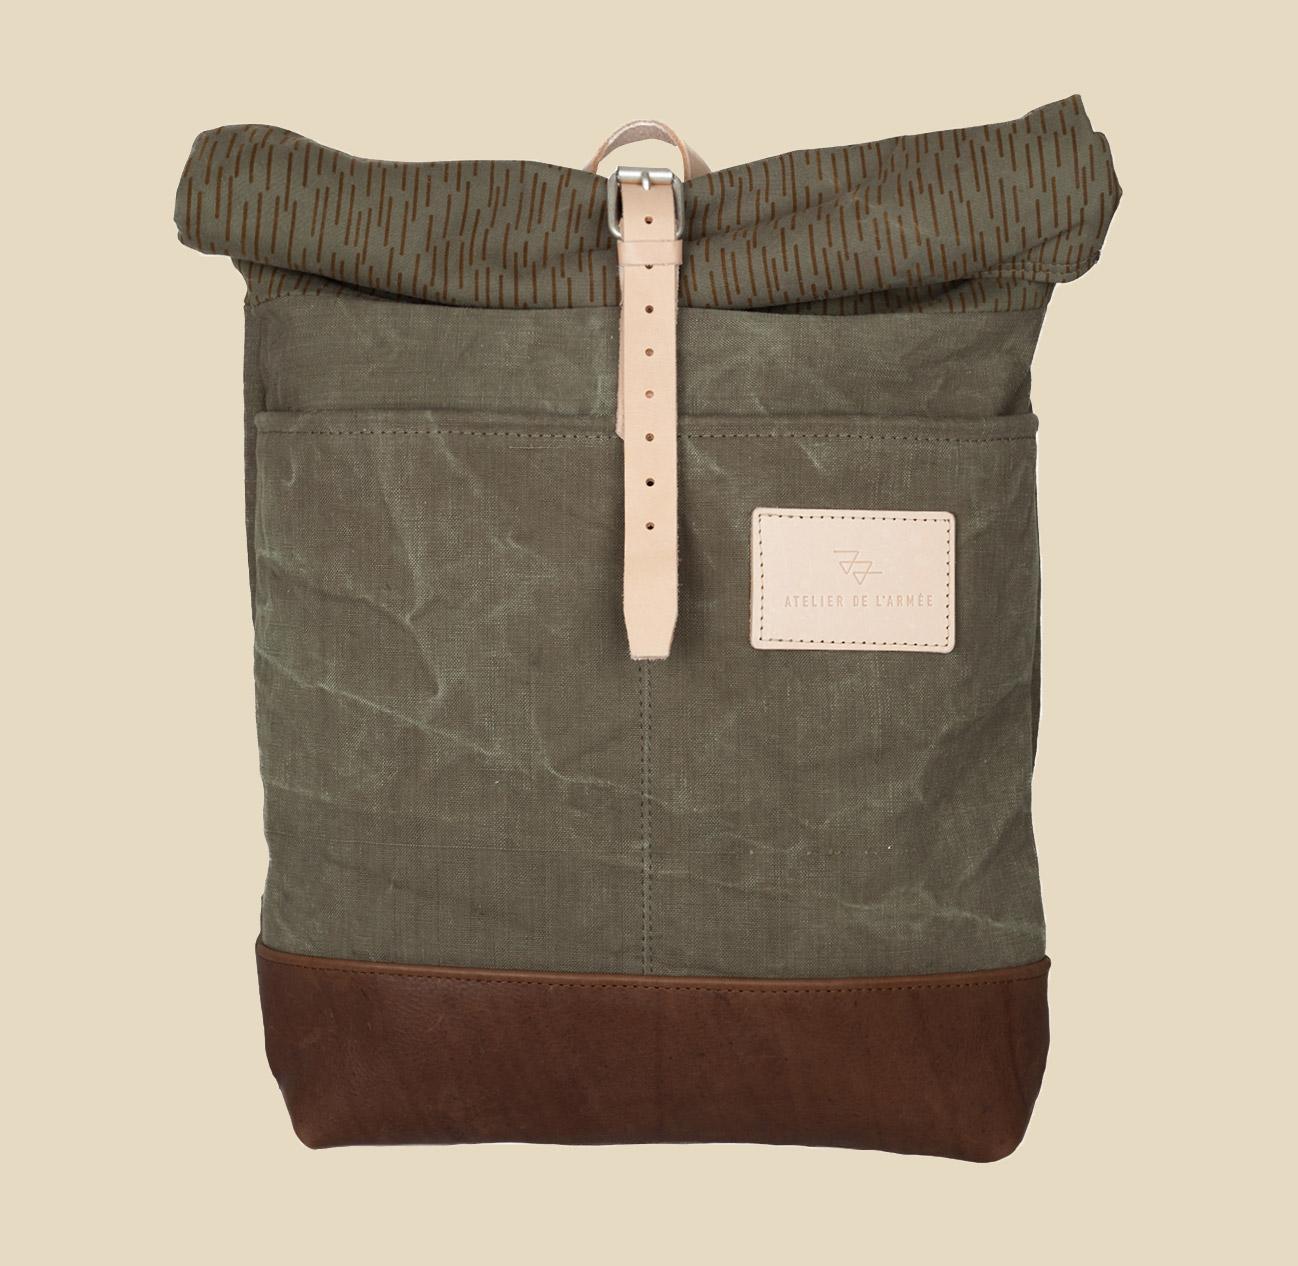 Atelier L'Armee Raindrop Camo Bag